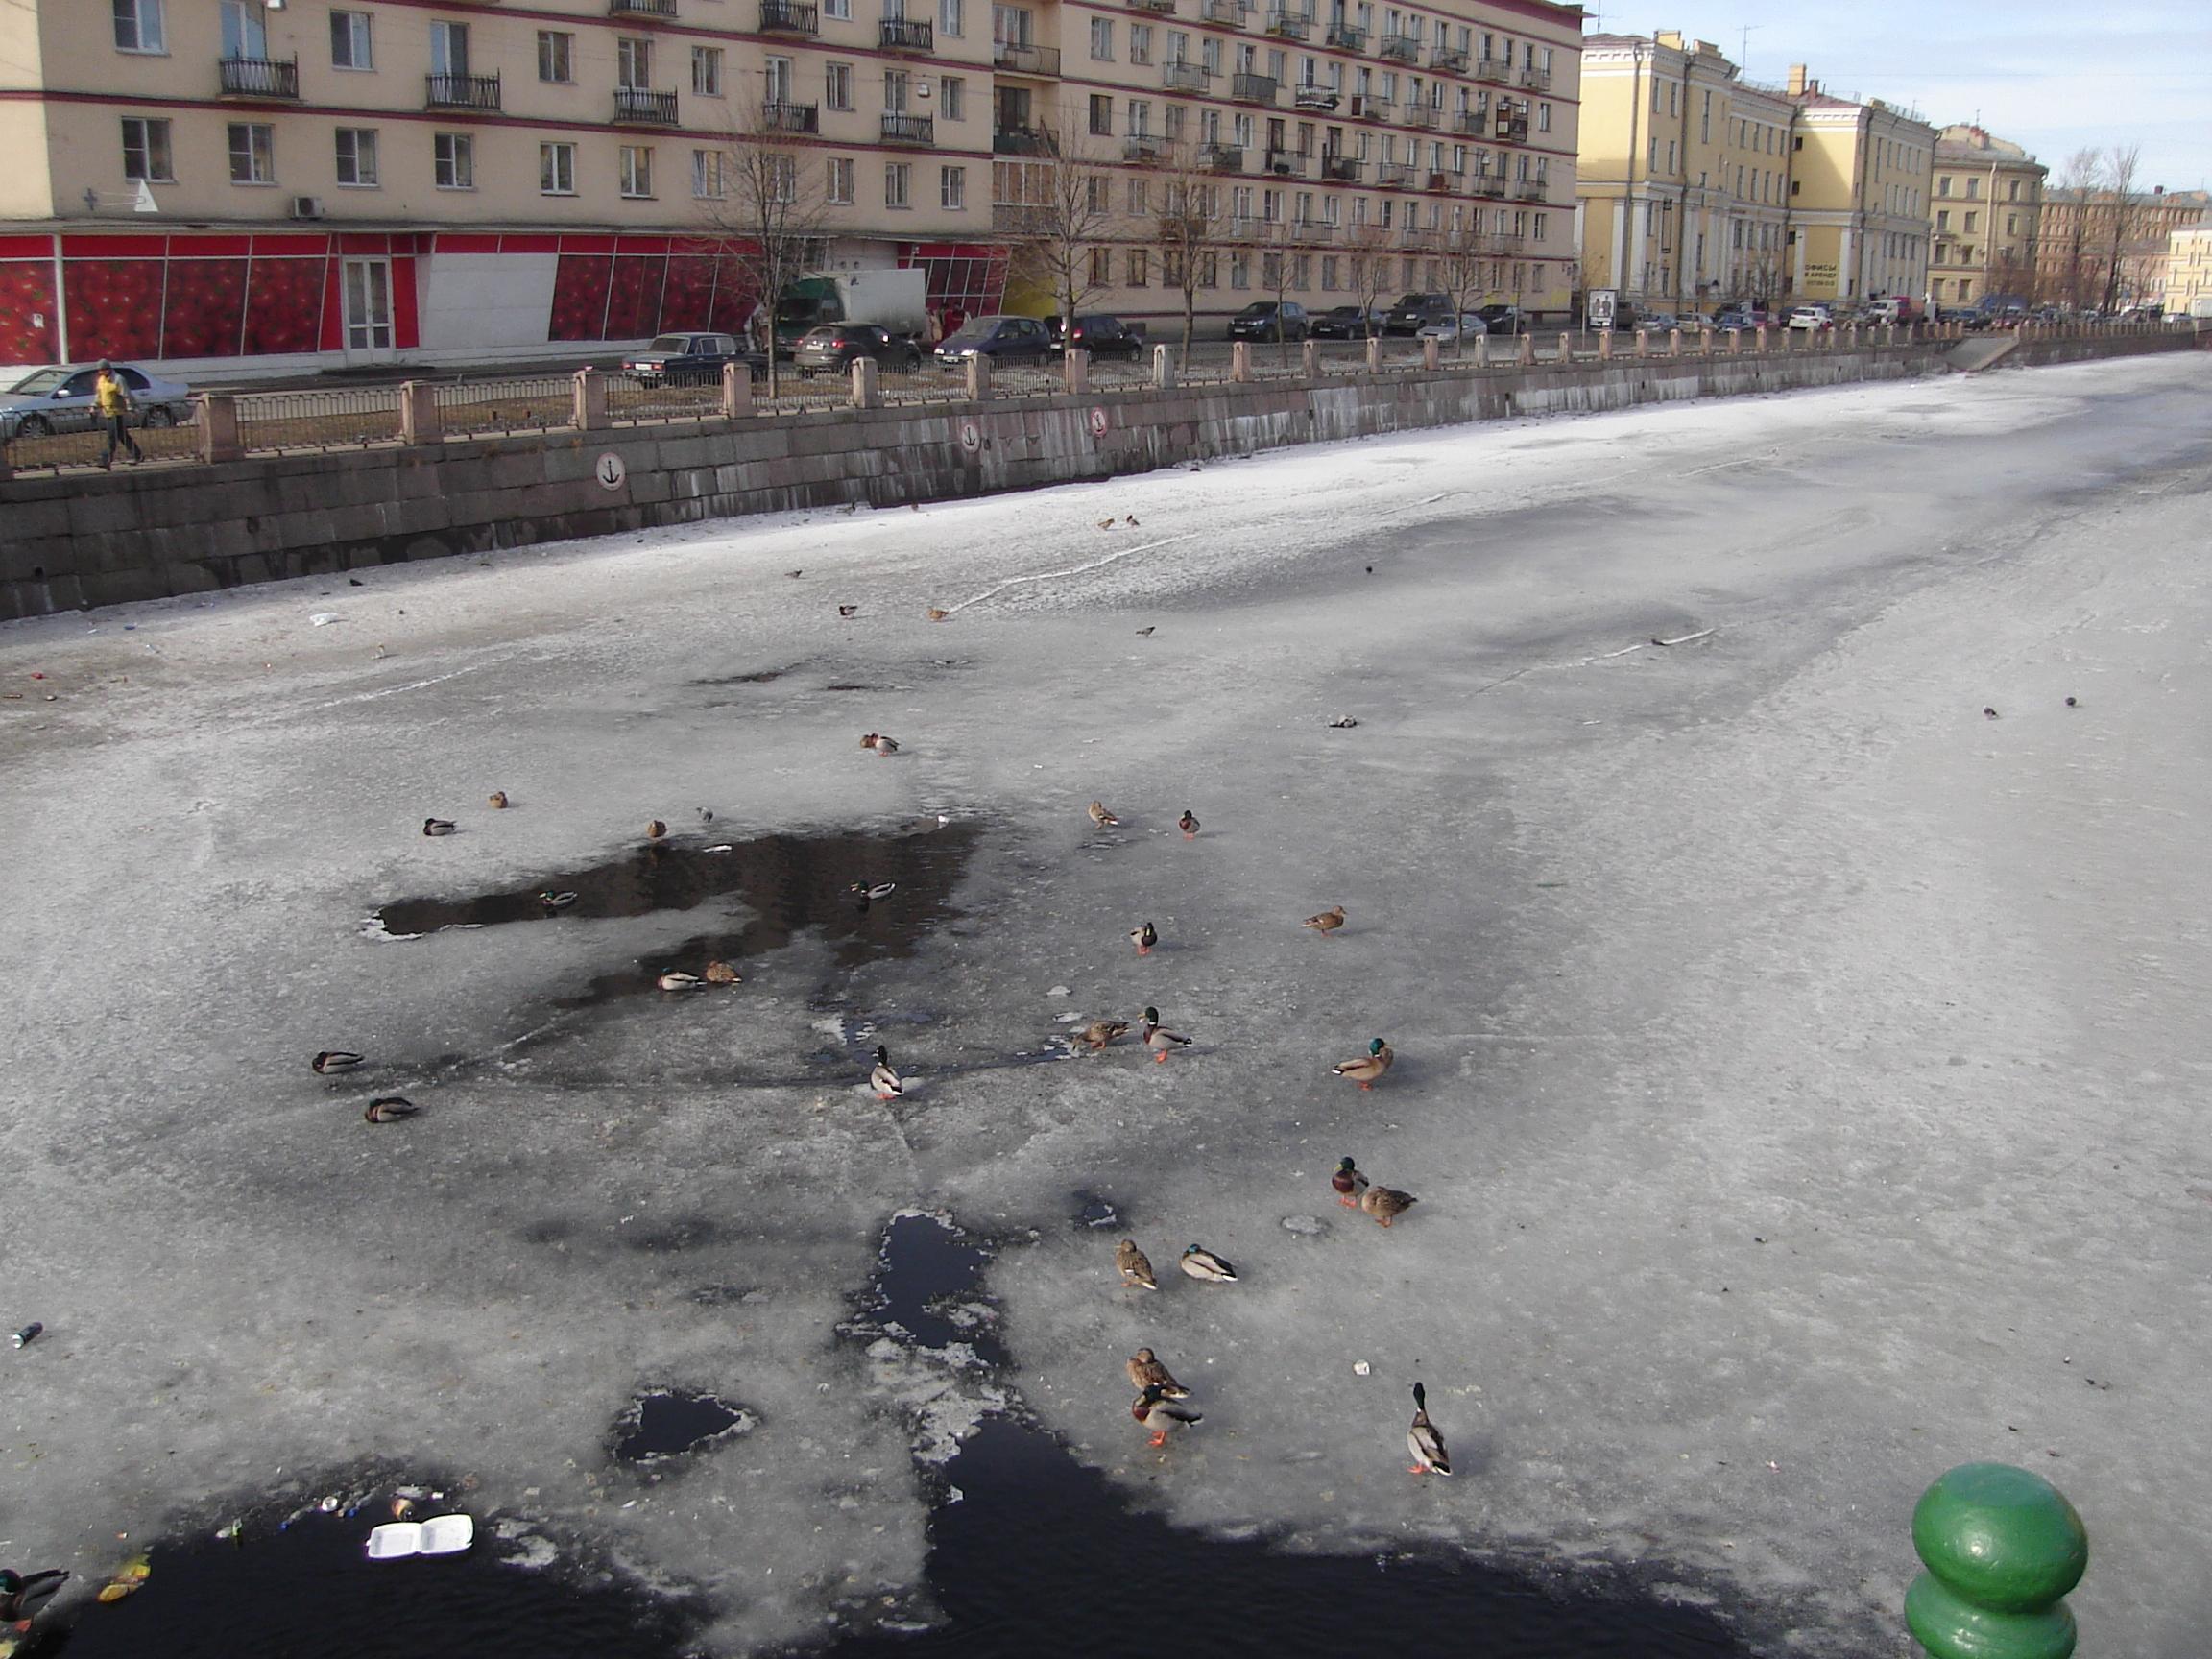 St Petersburg canal & ducks